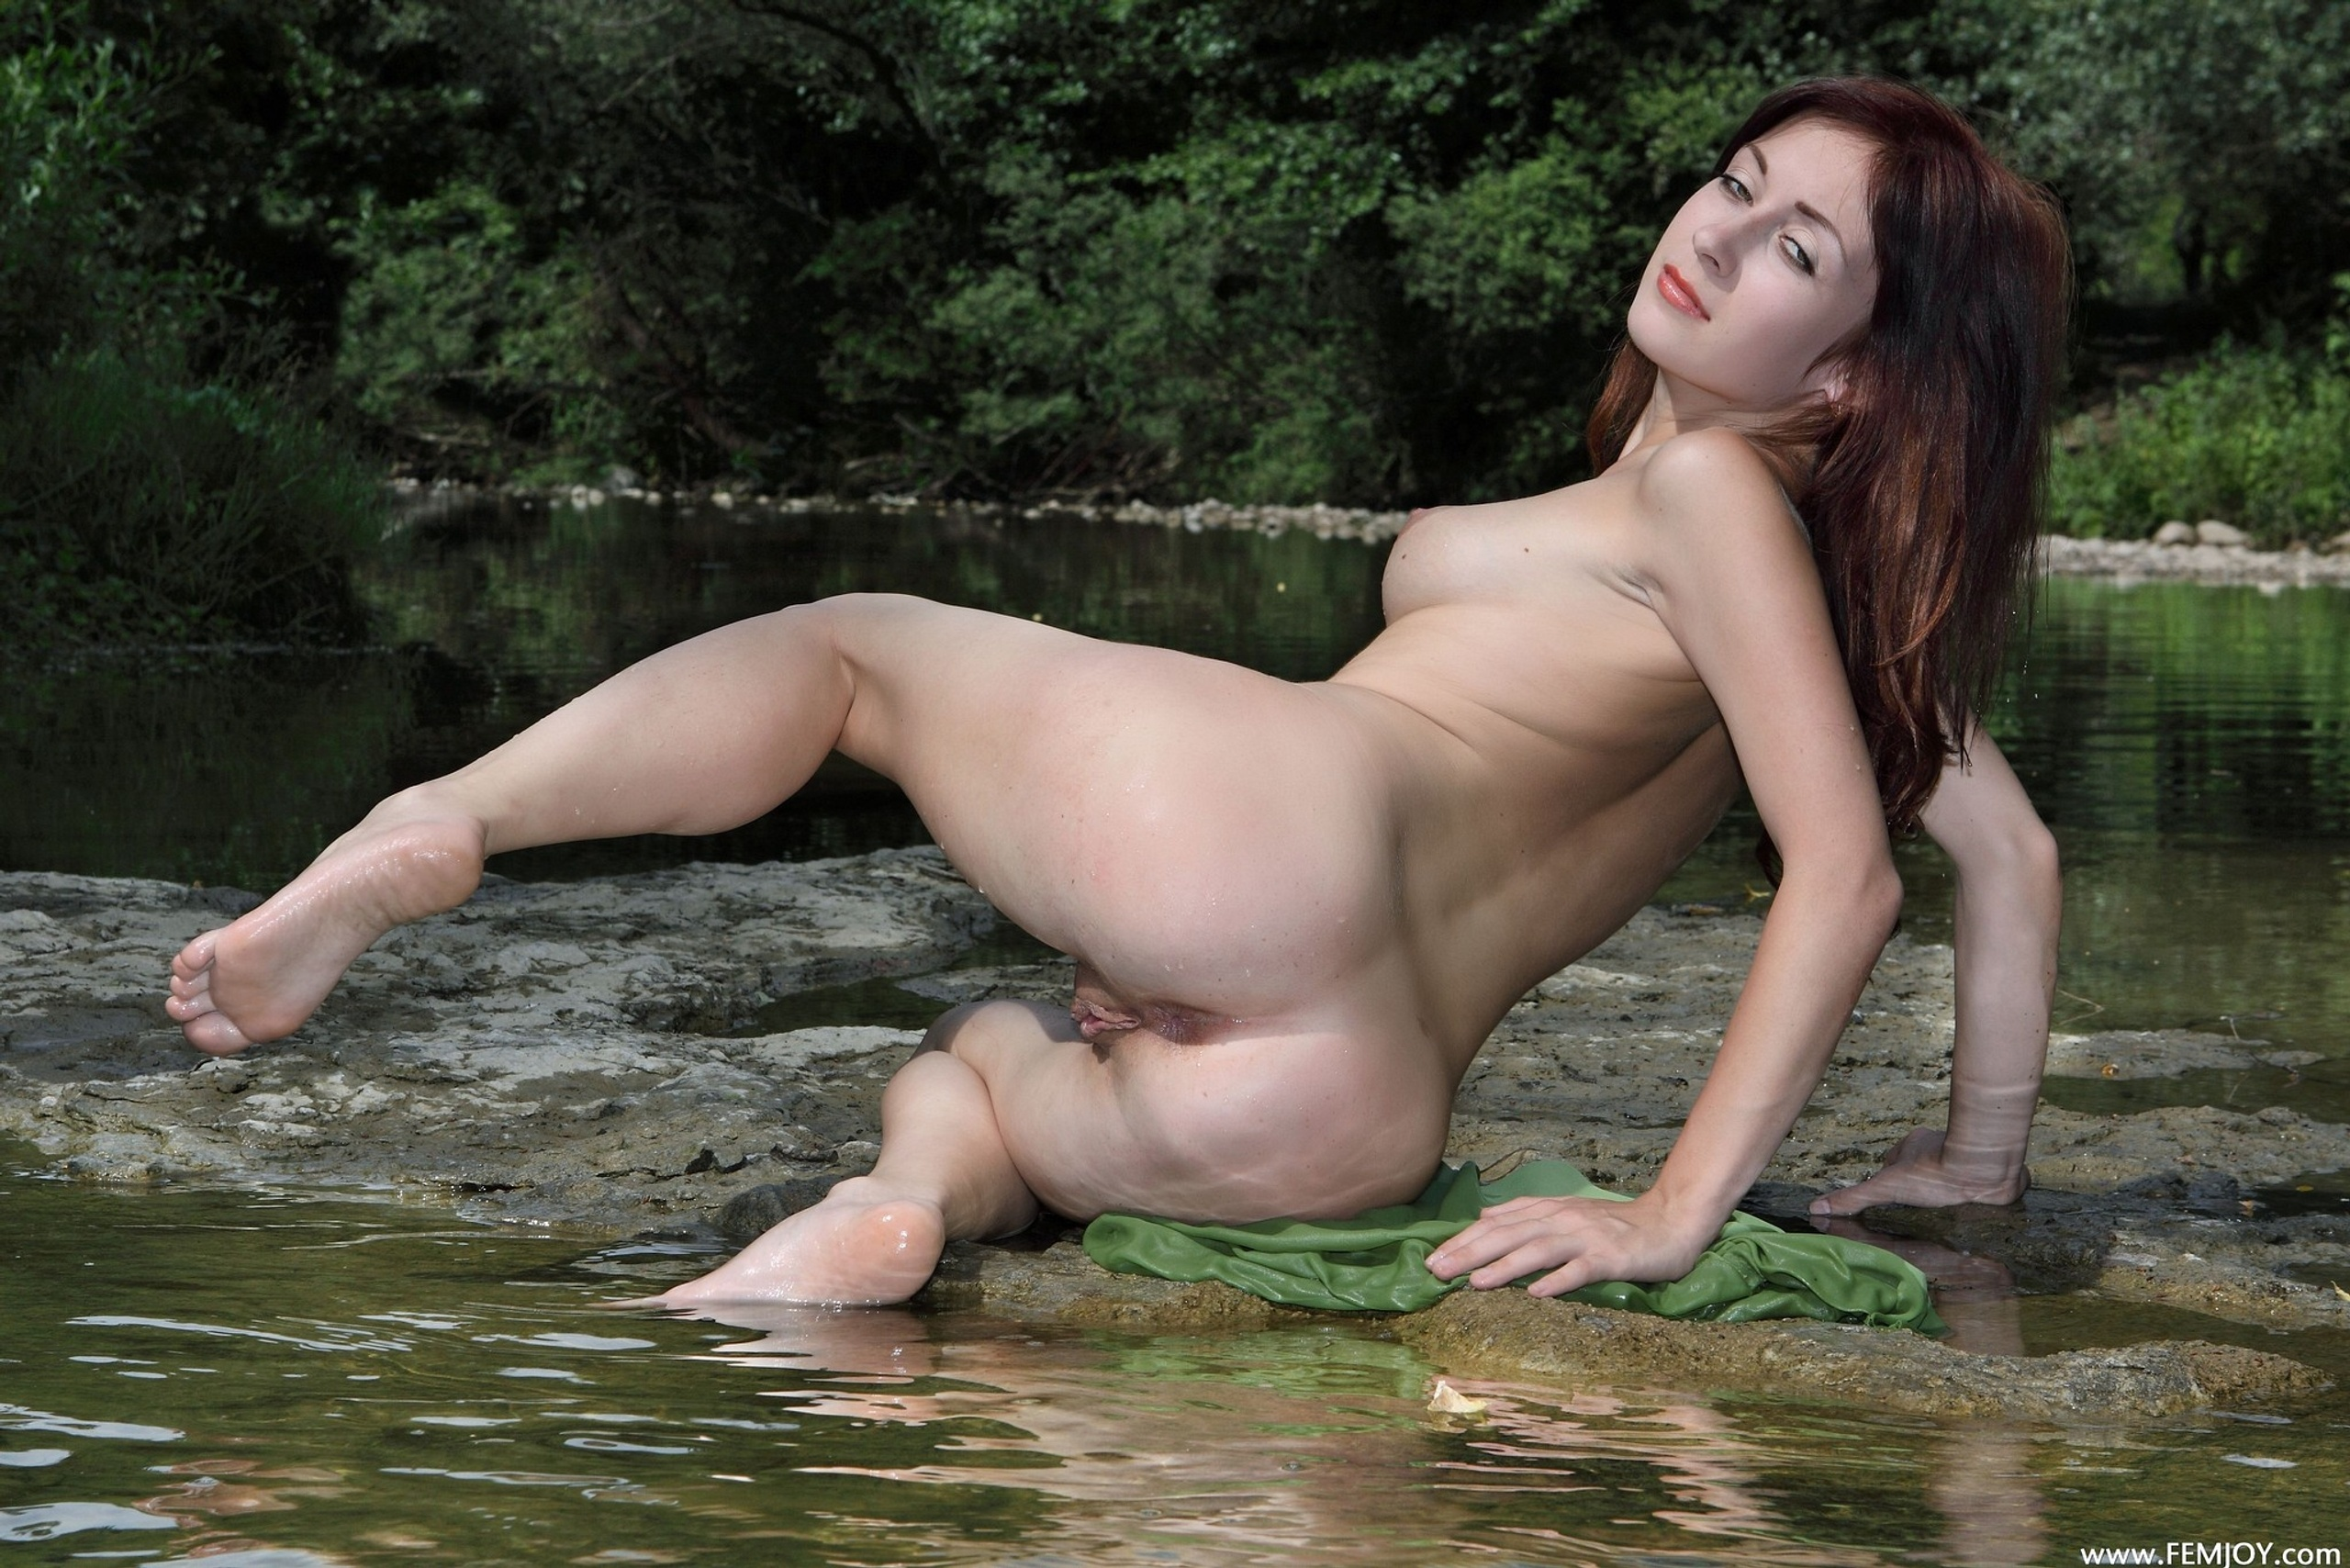 selena gomez pussy ass